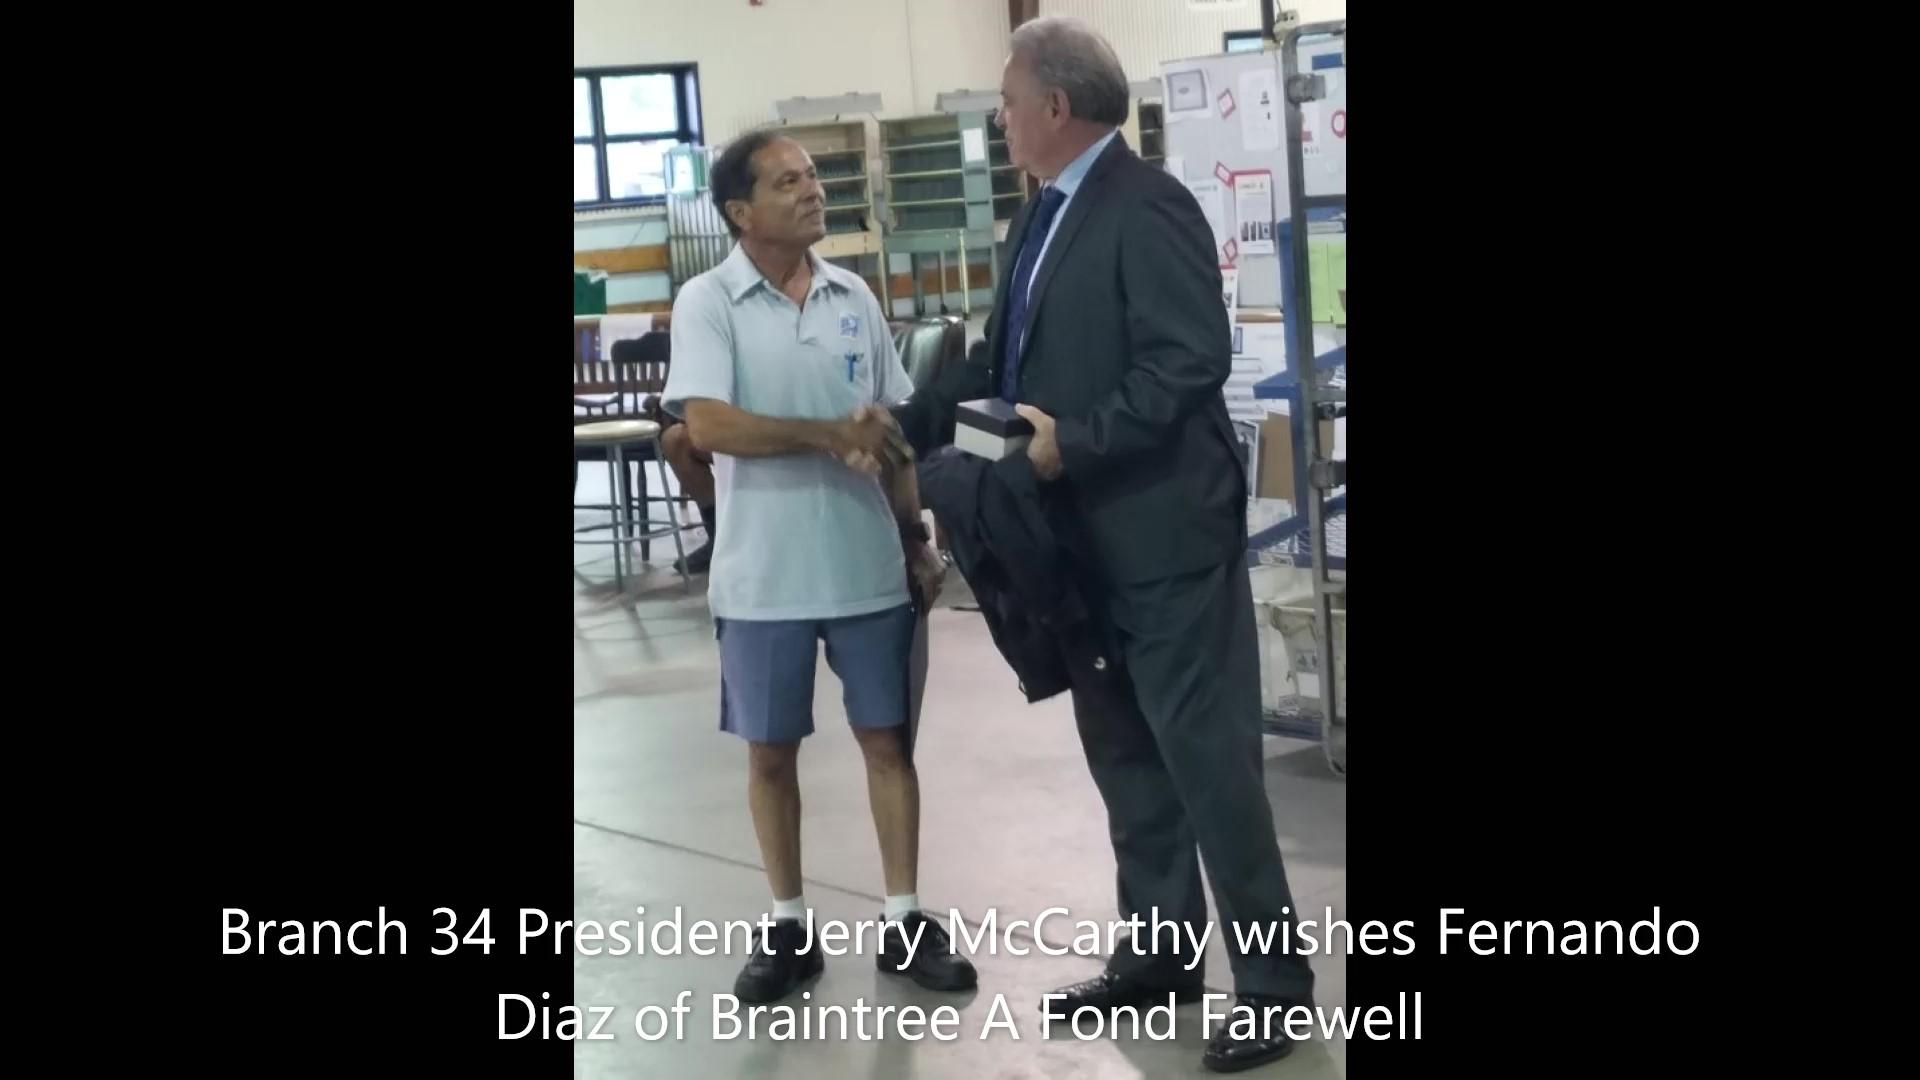 Fernando-Diaz-Braintree-Retires-62019-3_Large_Moment